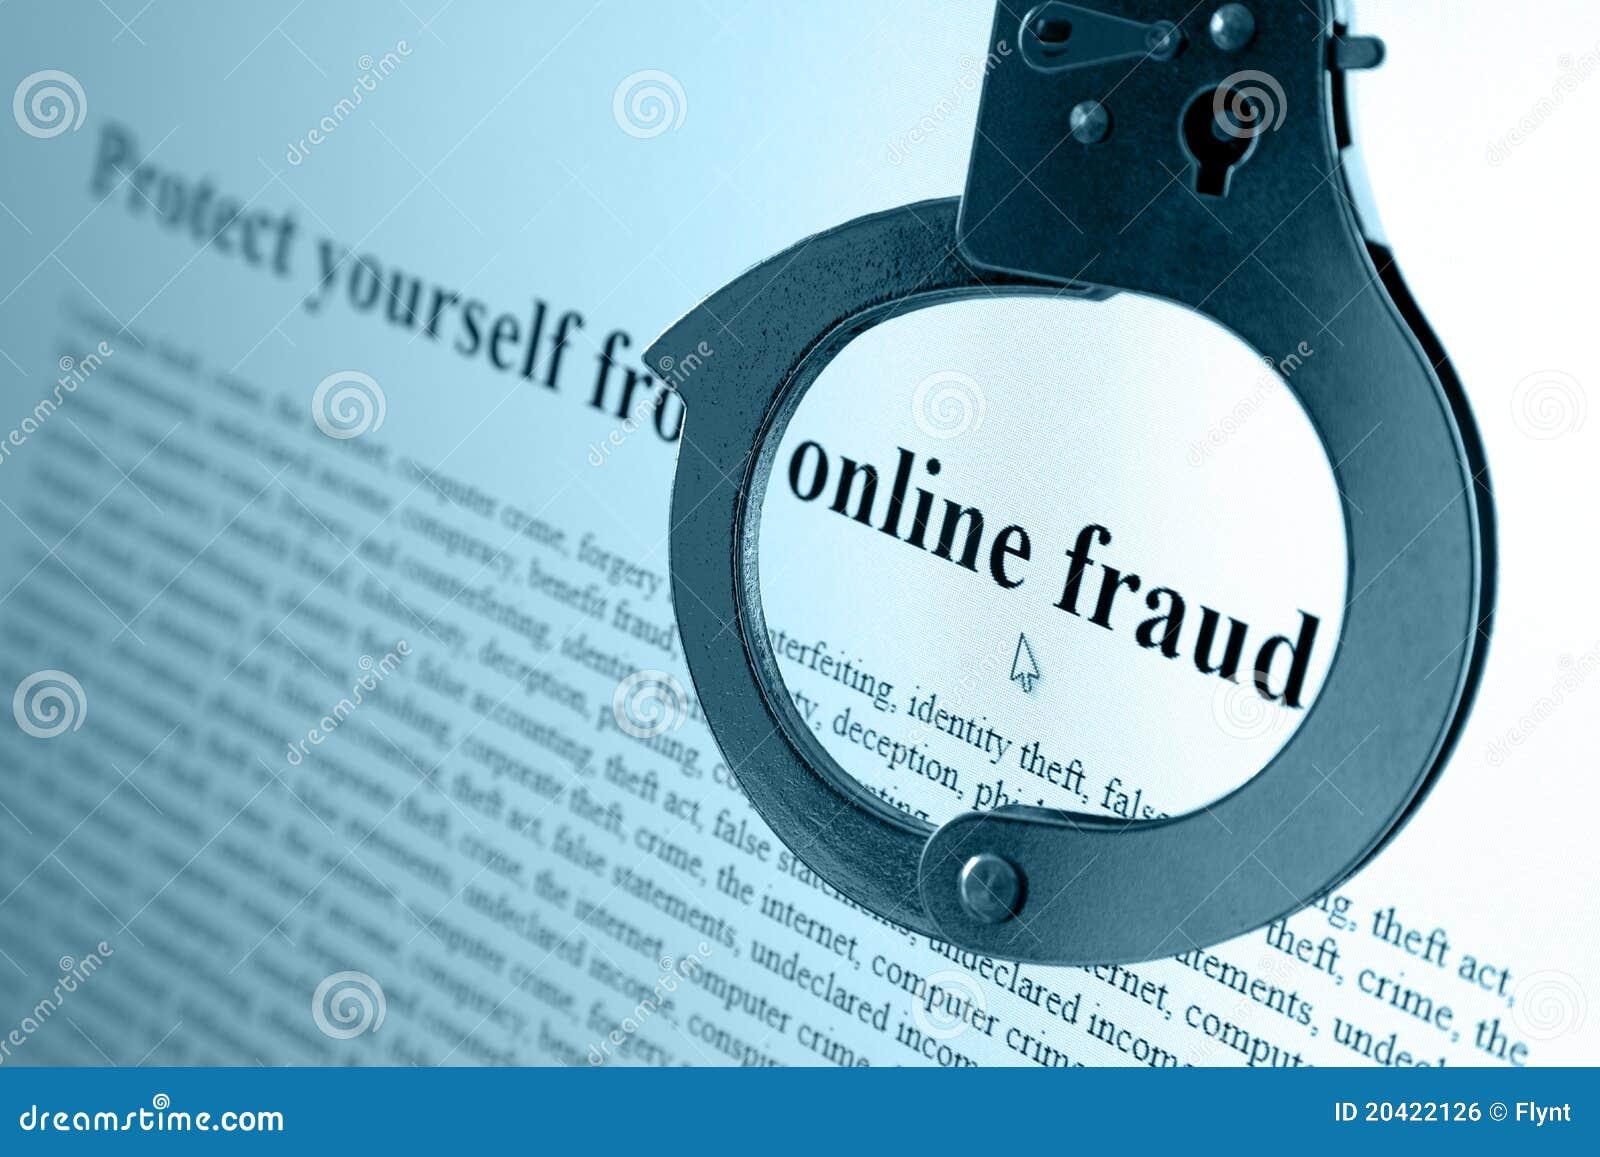 Online Fraude